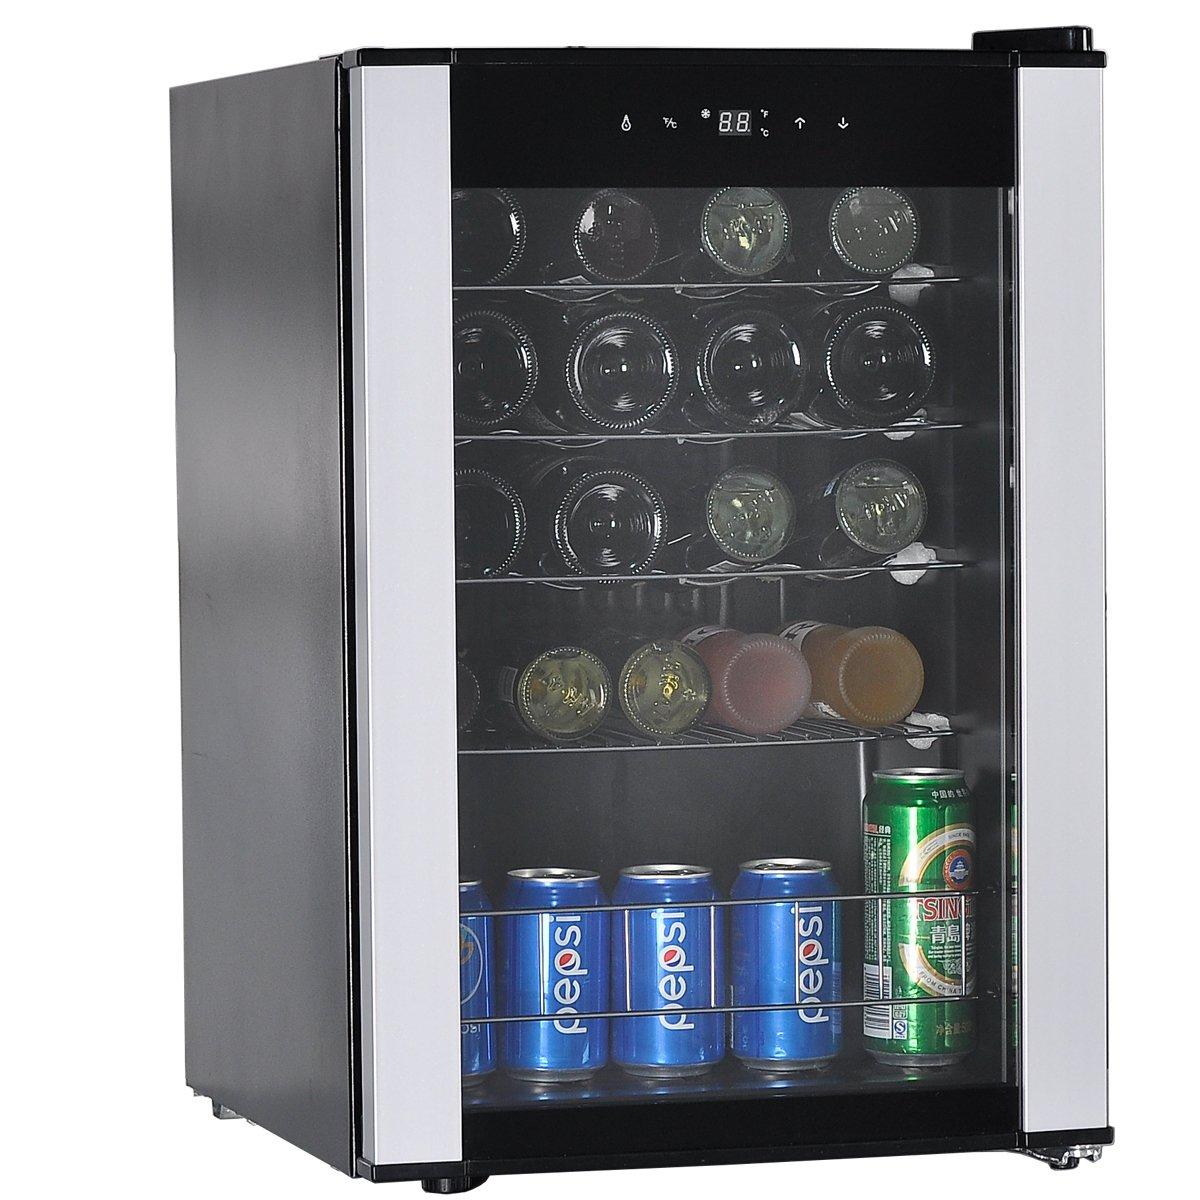 SMETA 19 Bottles Small Wine Refridgerator Compressor Freestanding Wine Cooler with LED Display Wine Cellar Fridge by SMETA